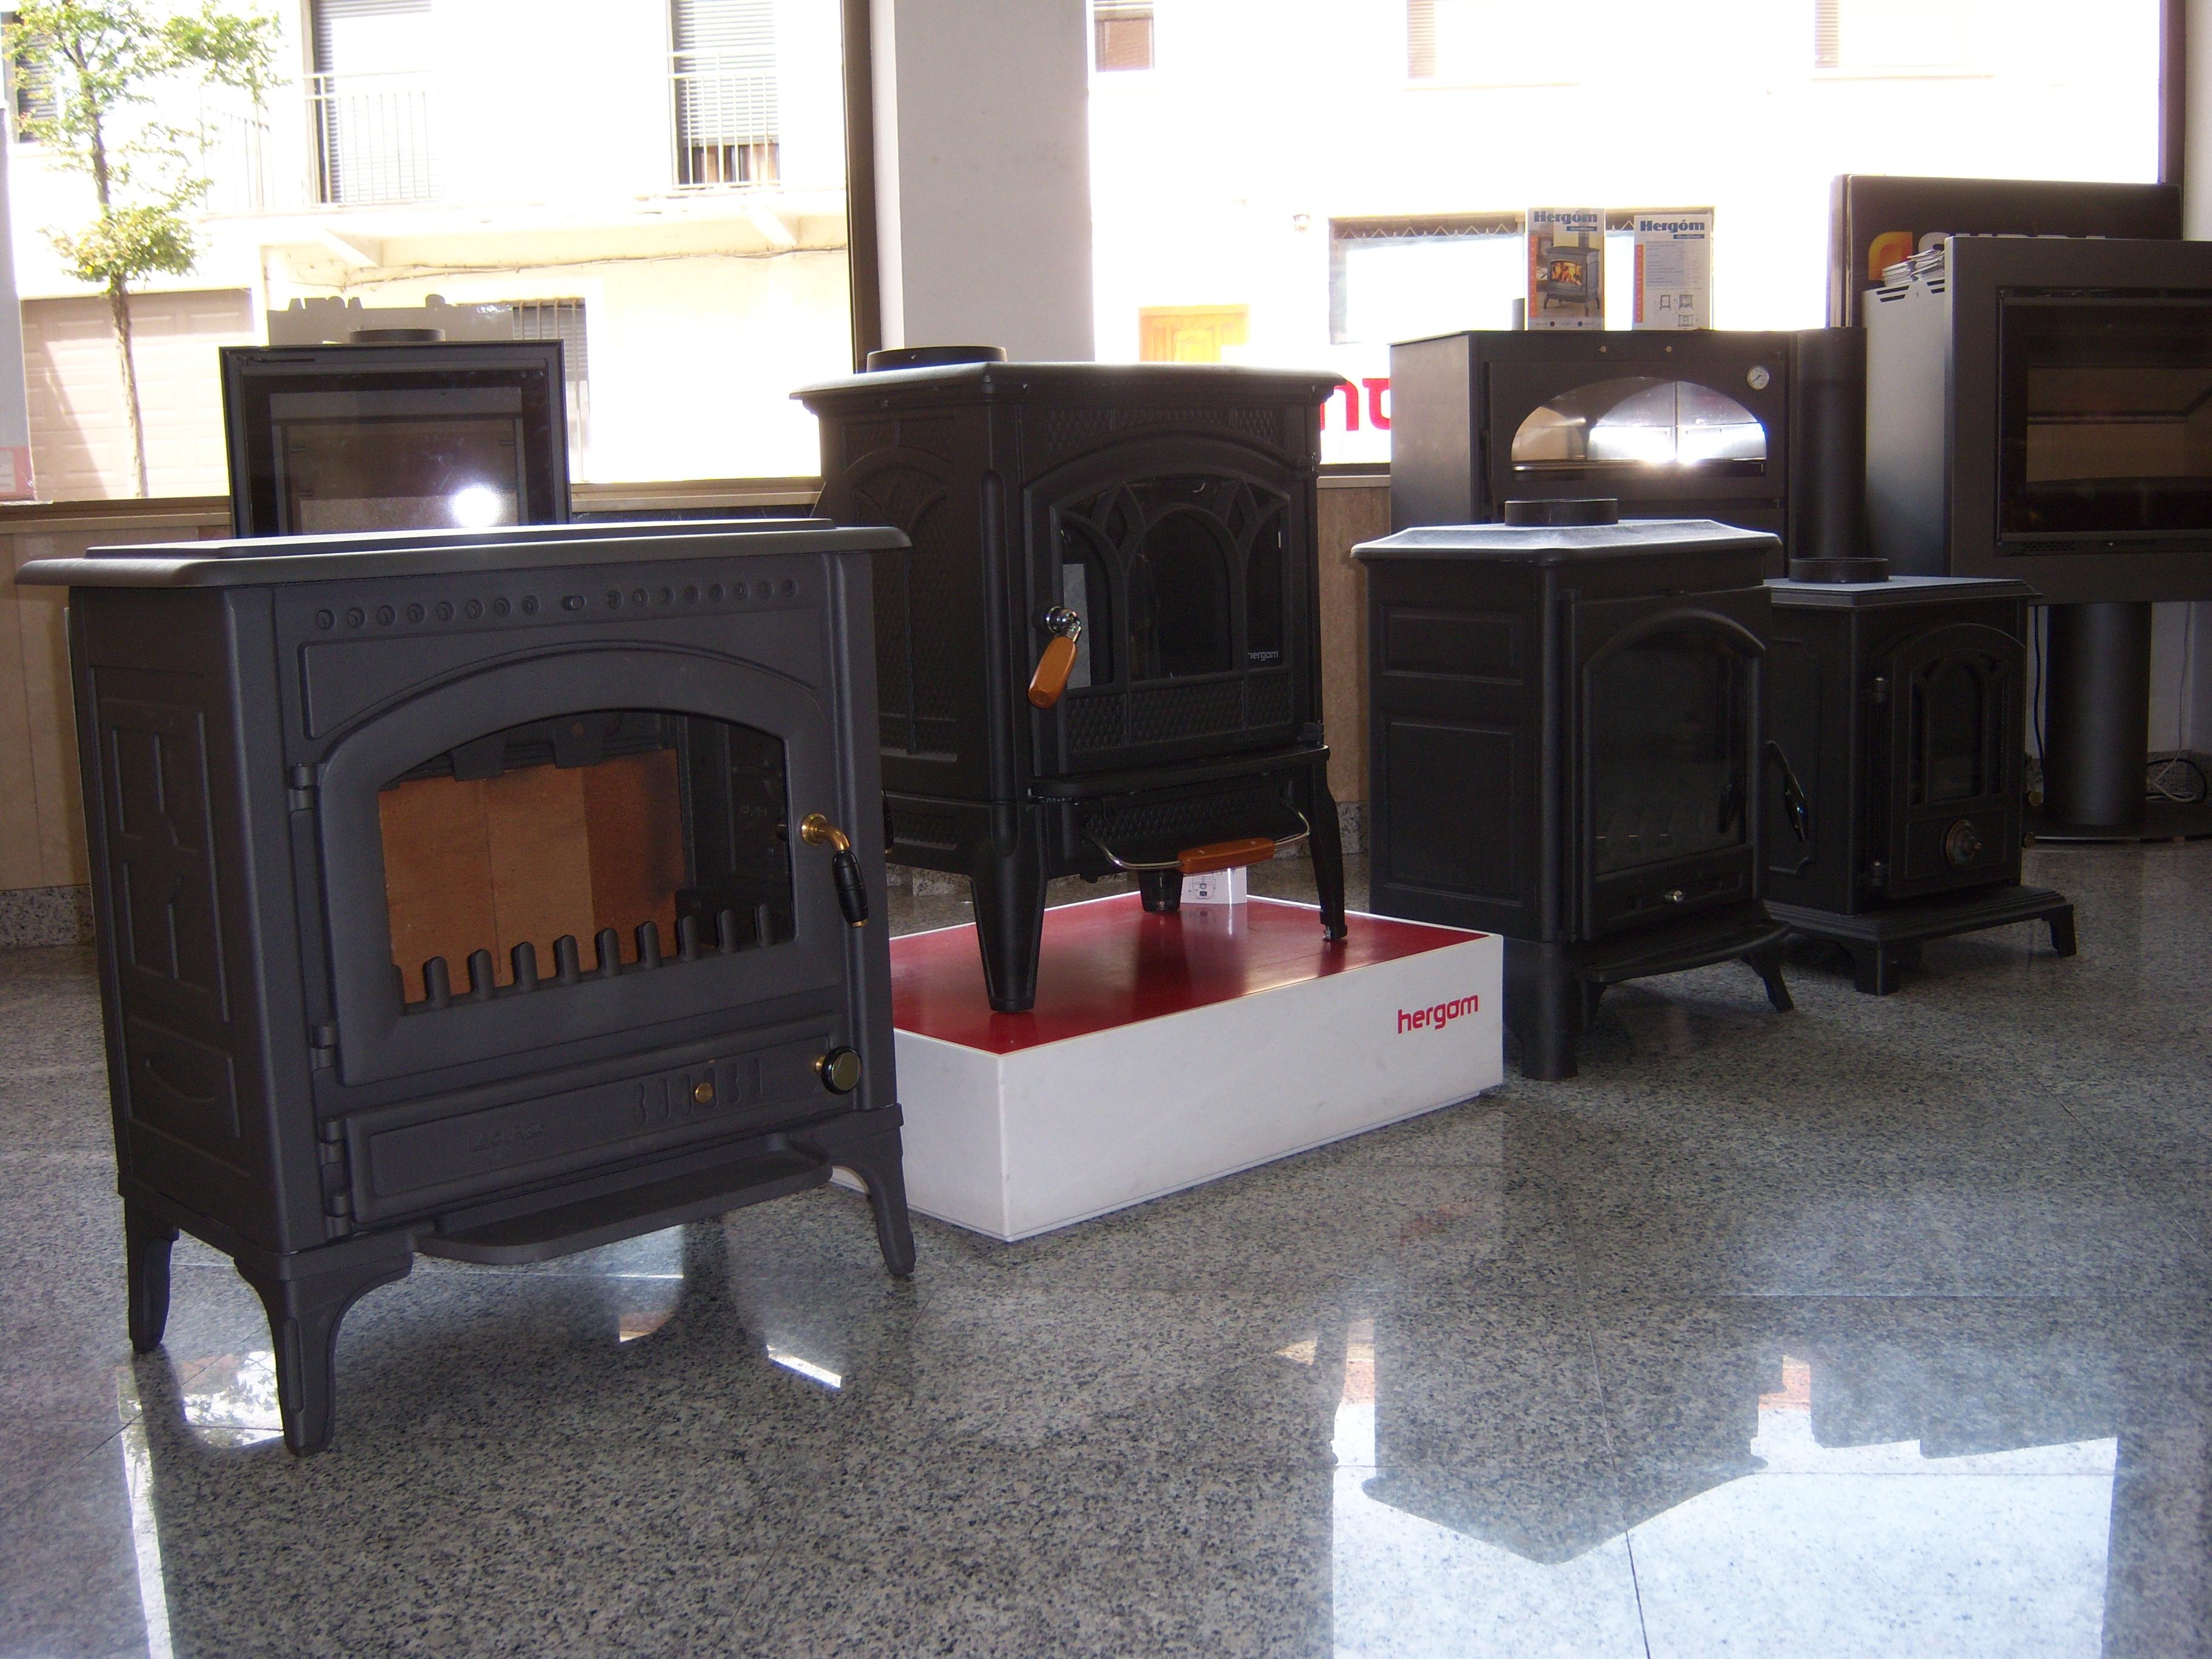 Estufas de hierro fundido en Chimeneas Molina